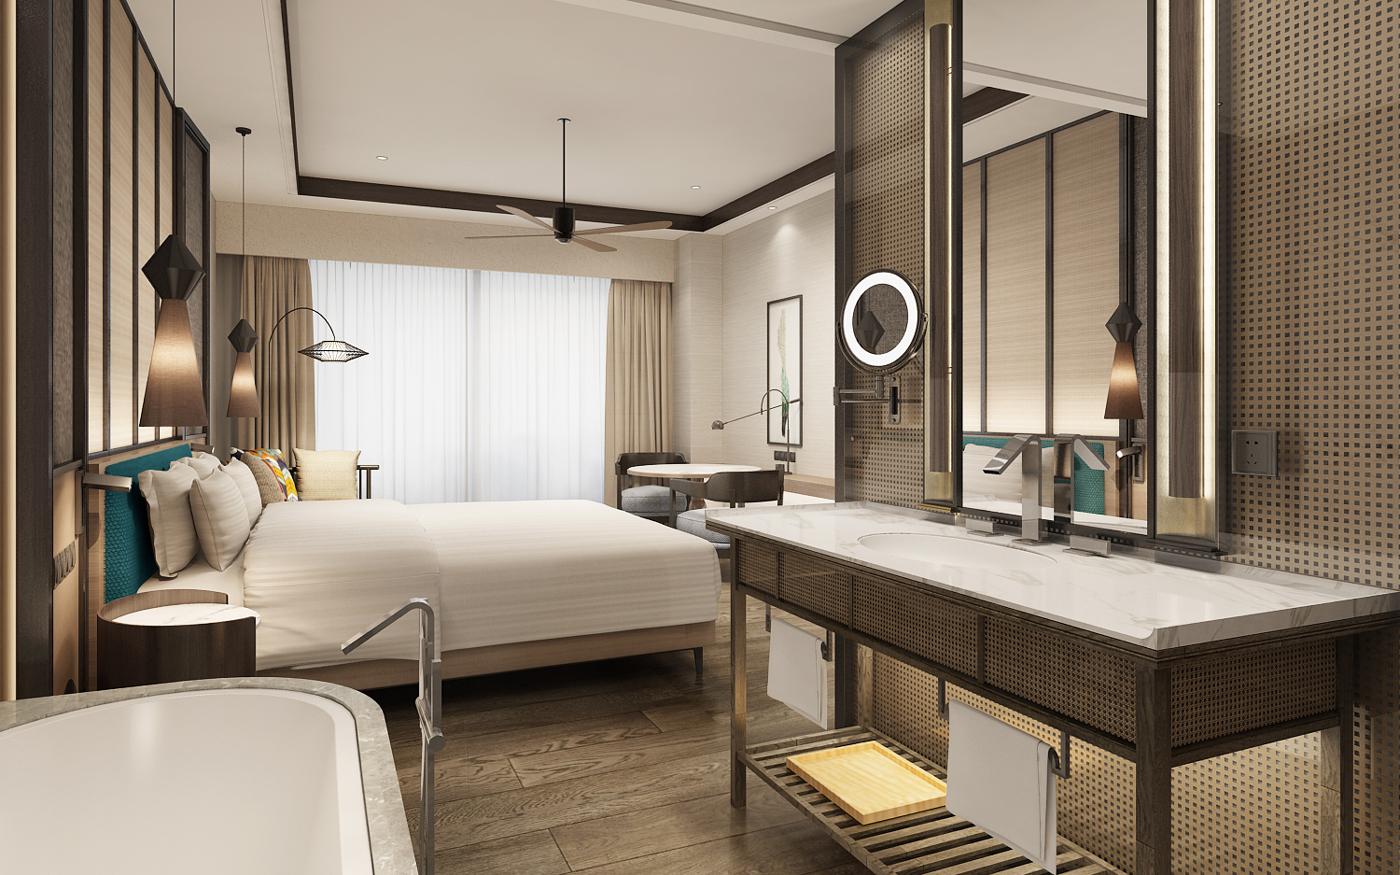 Doubletree-By-Hilton-Resort-_web_3